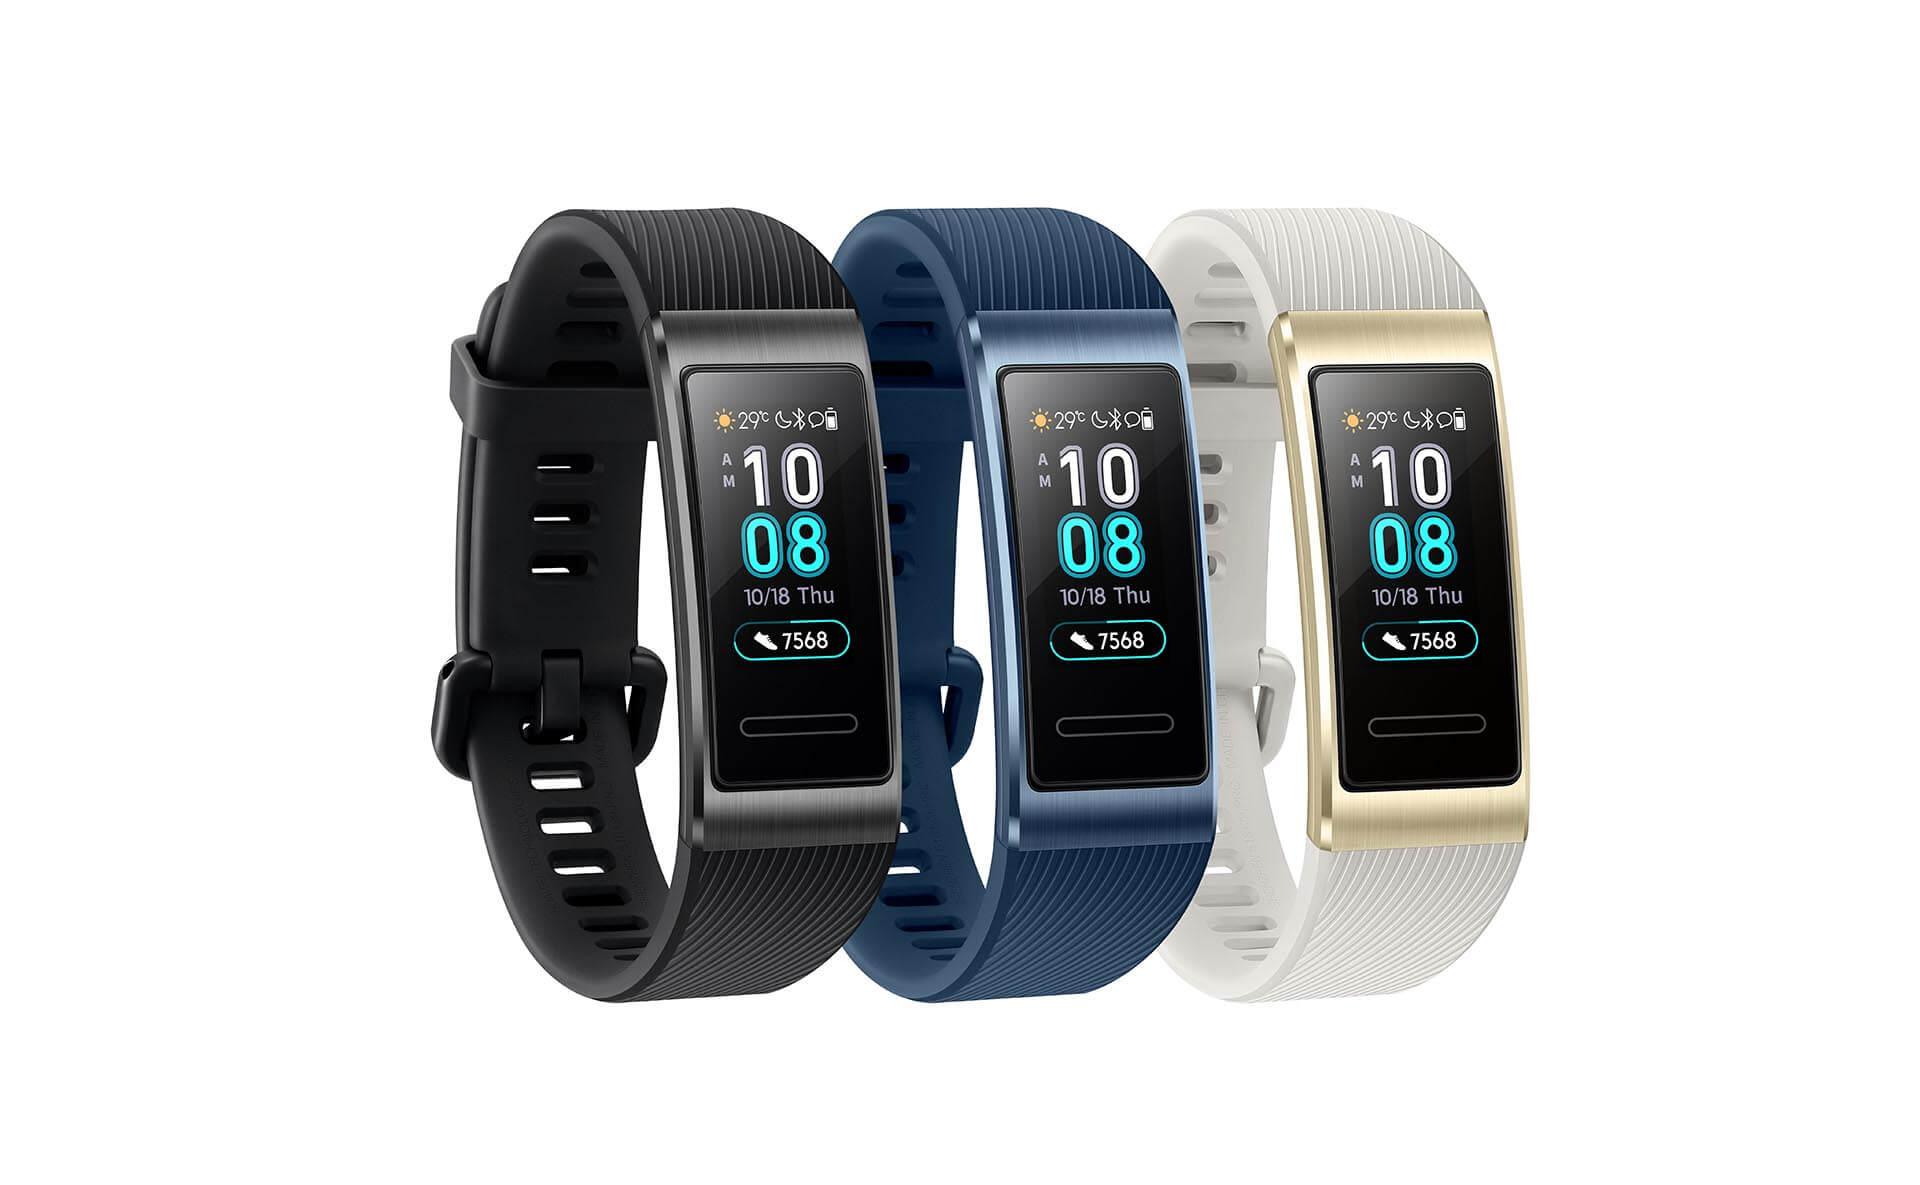 Watch GT, Band 3e und Band 3 Pro: Huawei stellt neue Wearables vor techboys.de • smarte News, auf den Punkt!